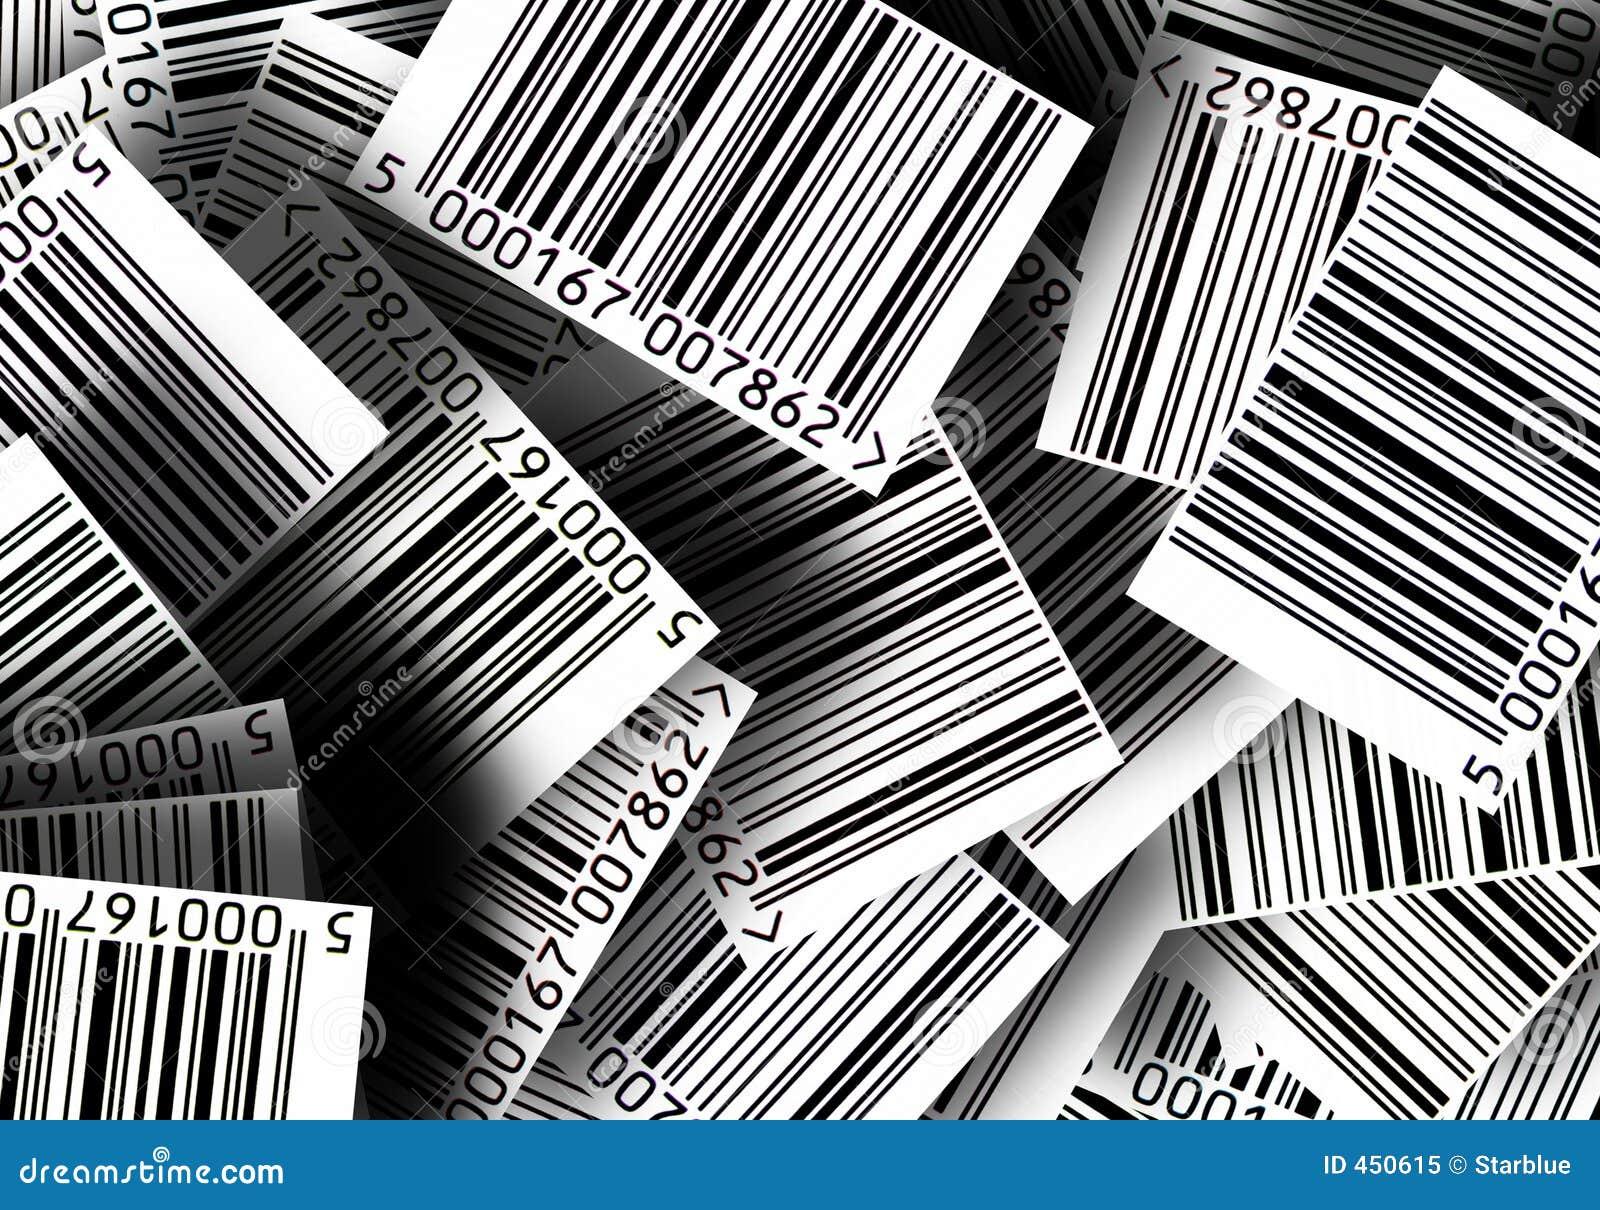 Barcodes background